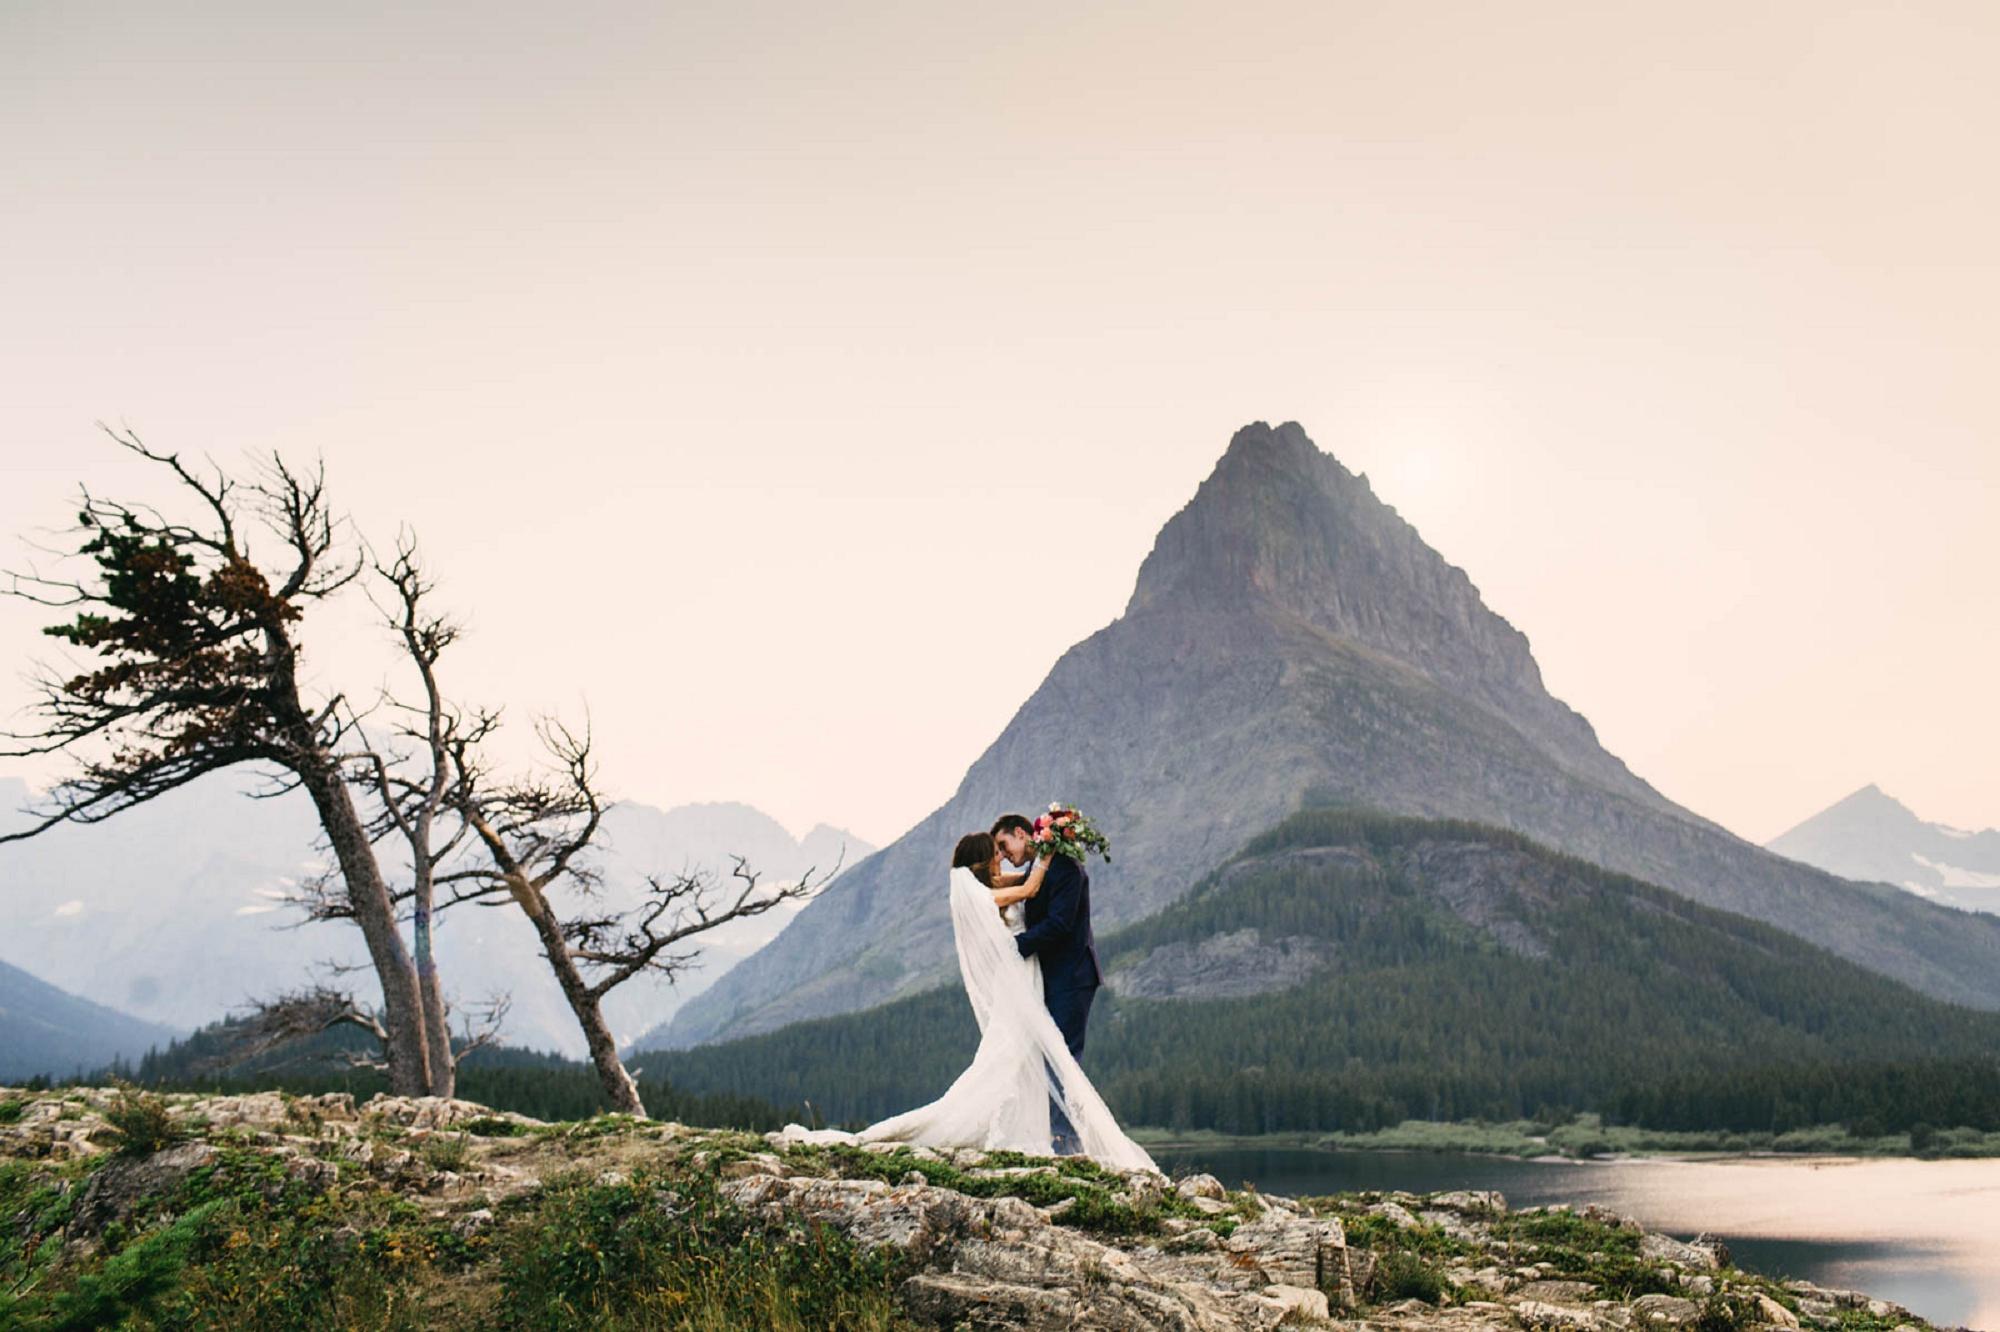 Jennifer_Mooney_Photography_Glacier_Park_Adventure_073.jpg